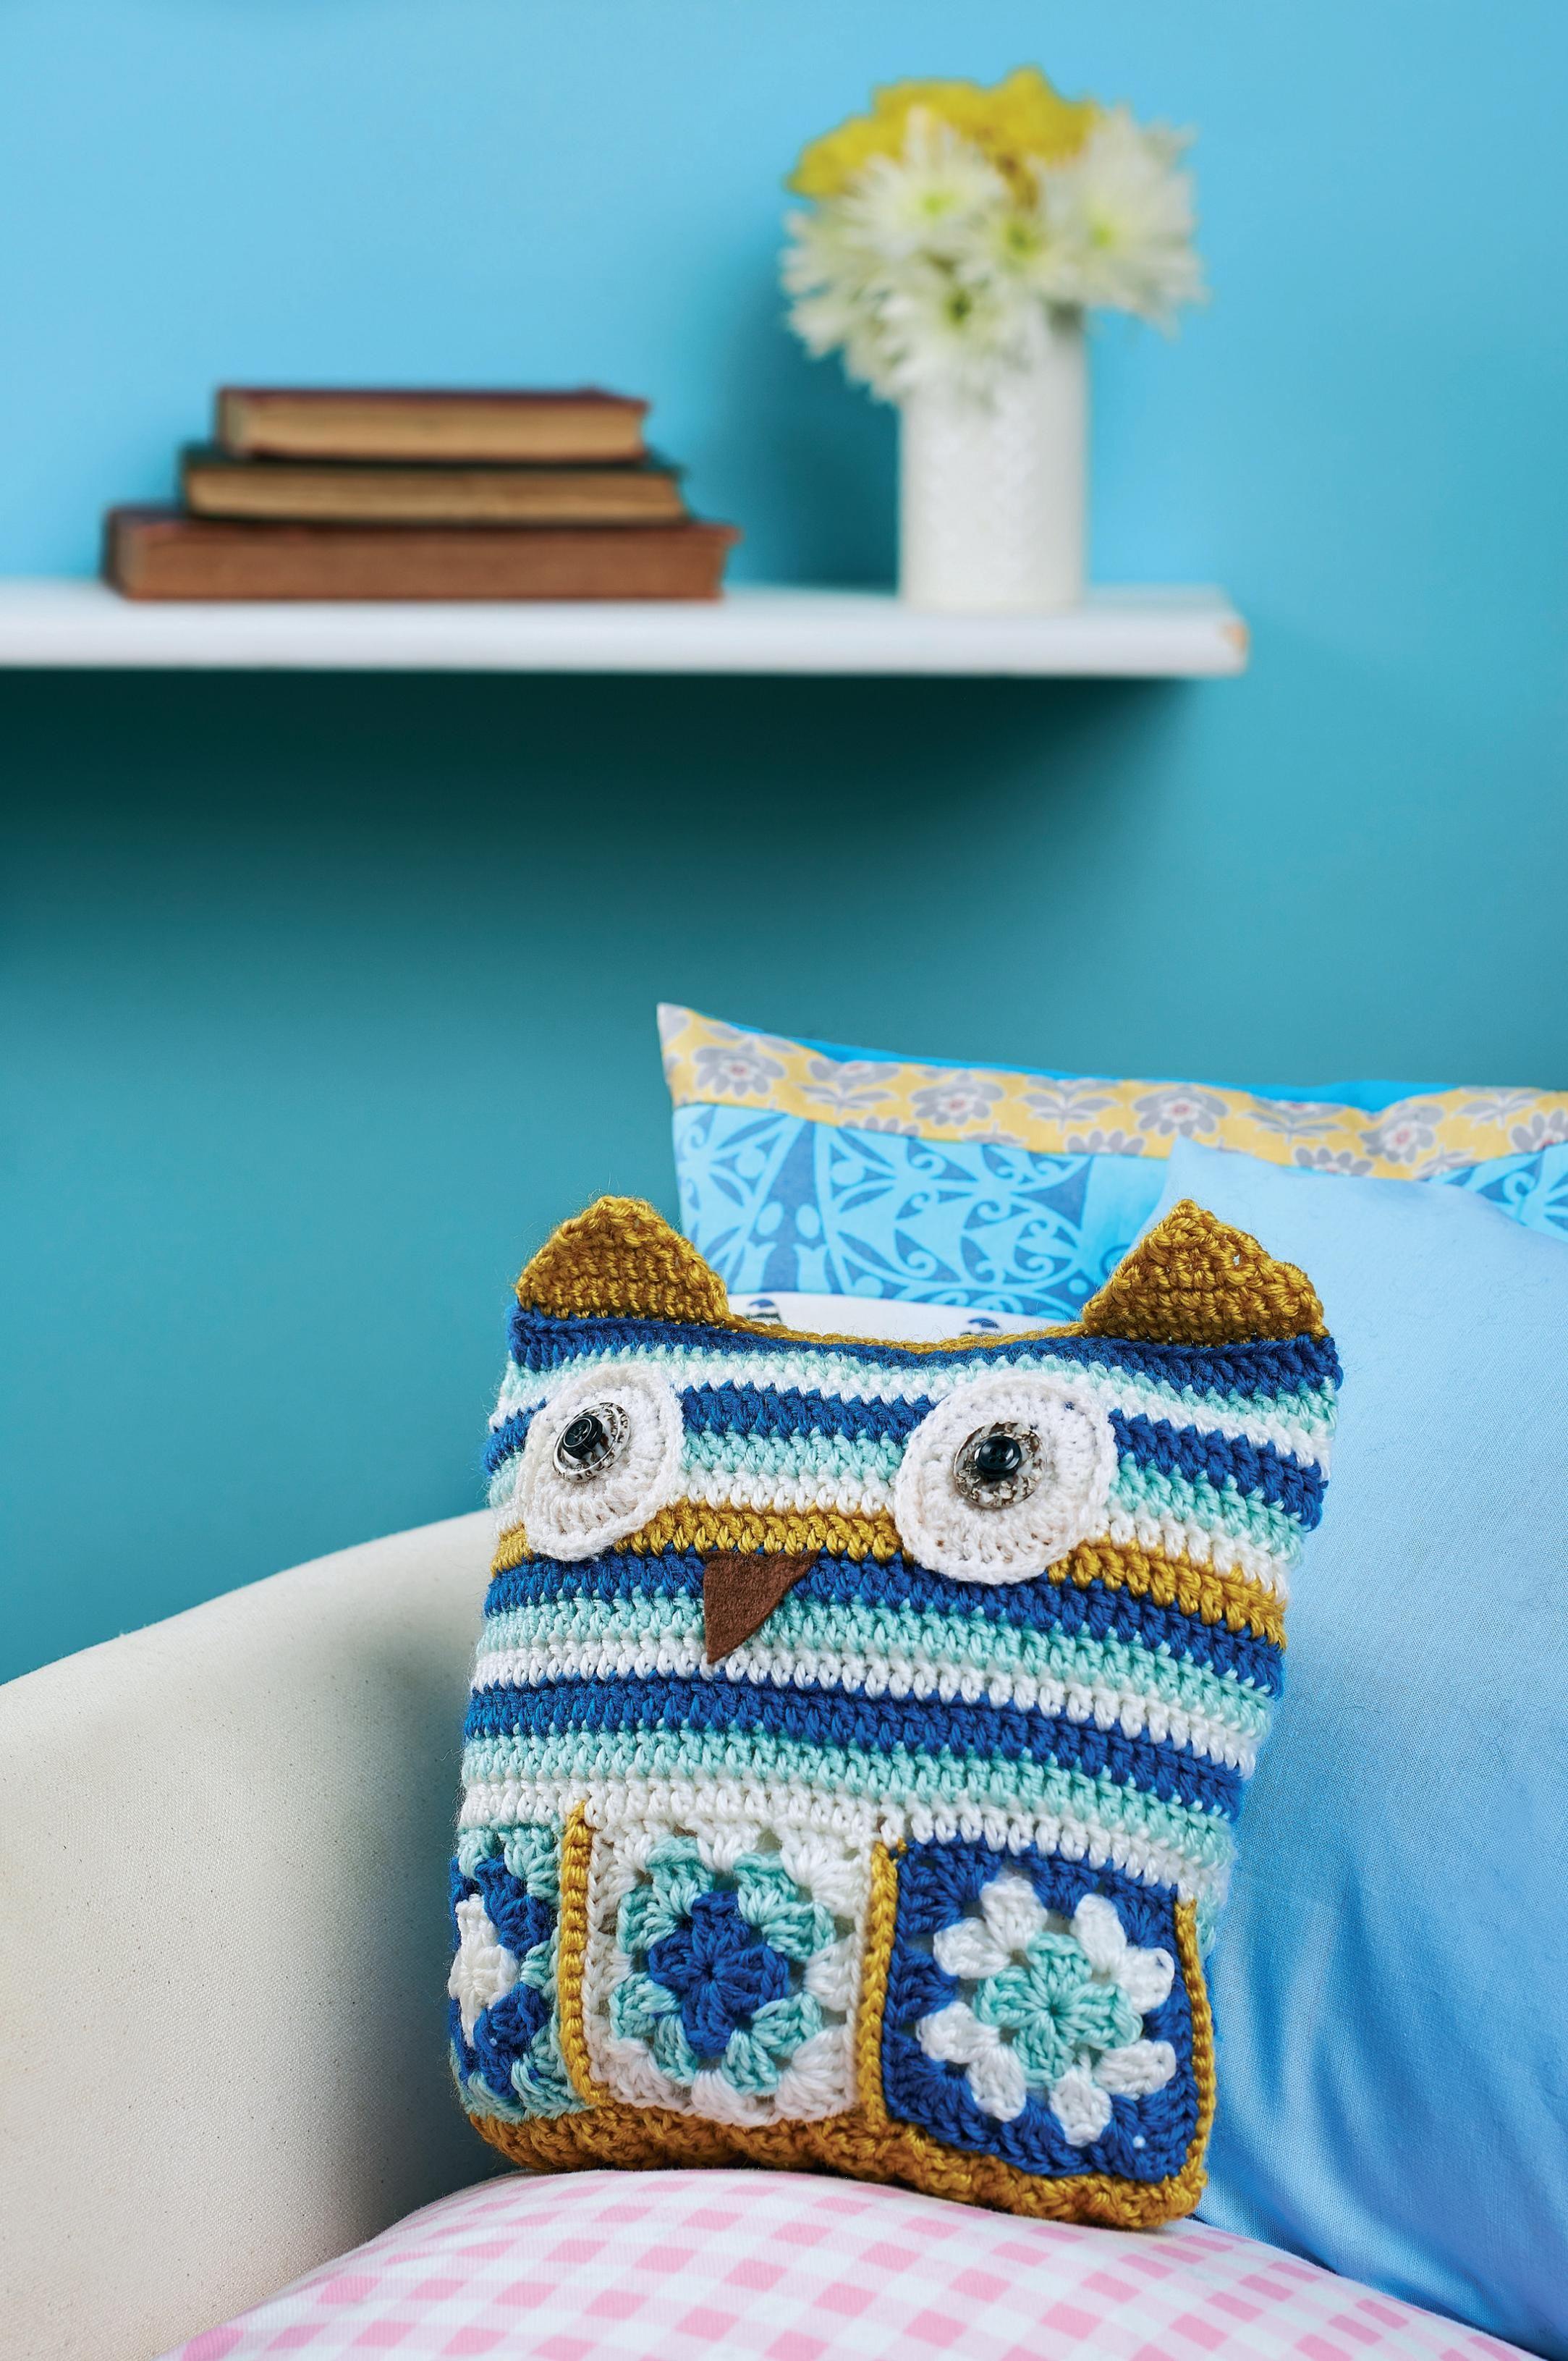 Crochet Owl Cushion free pattern pdf | pillows | Pinterest | Owl ...